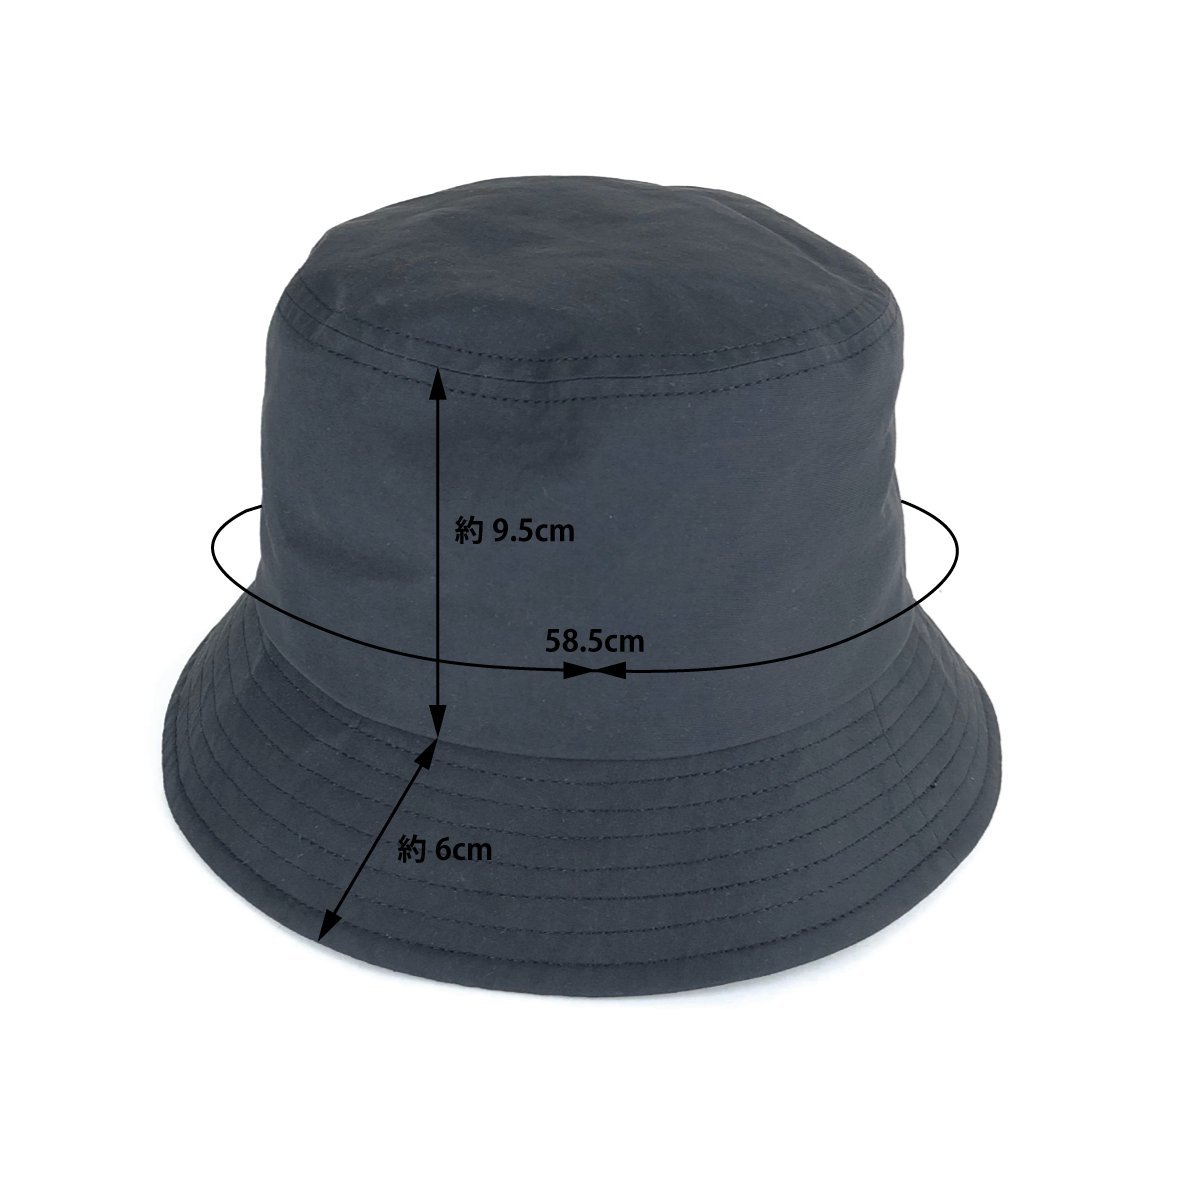 Genius BK Hat 詳細画像5